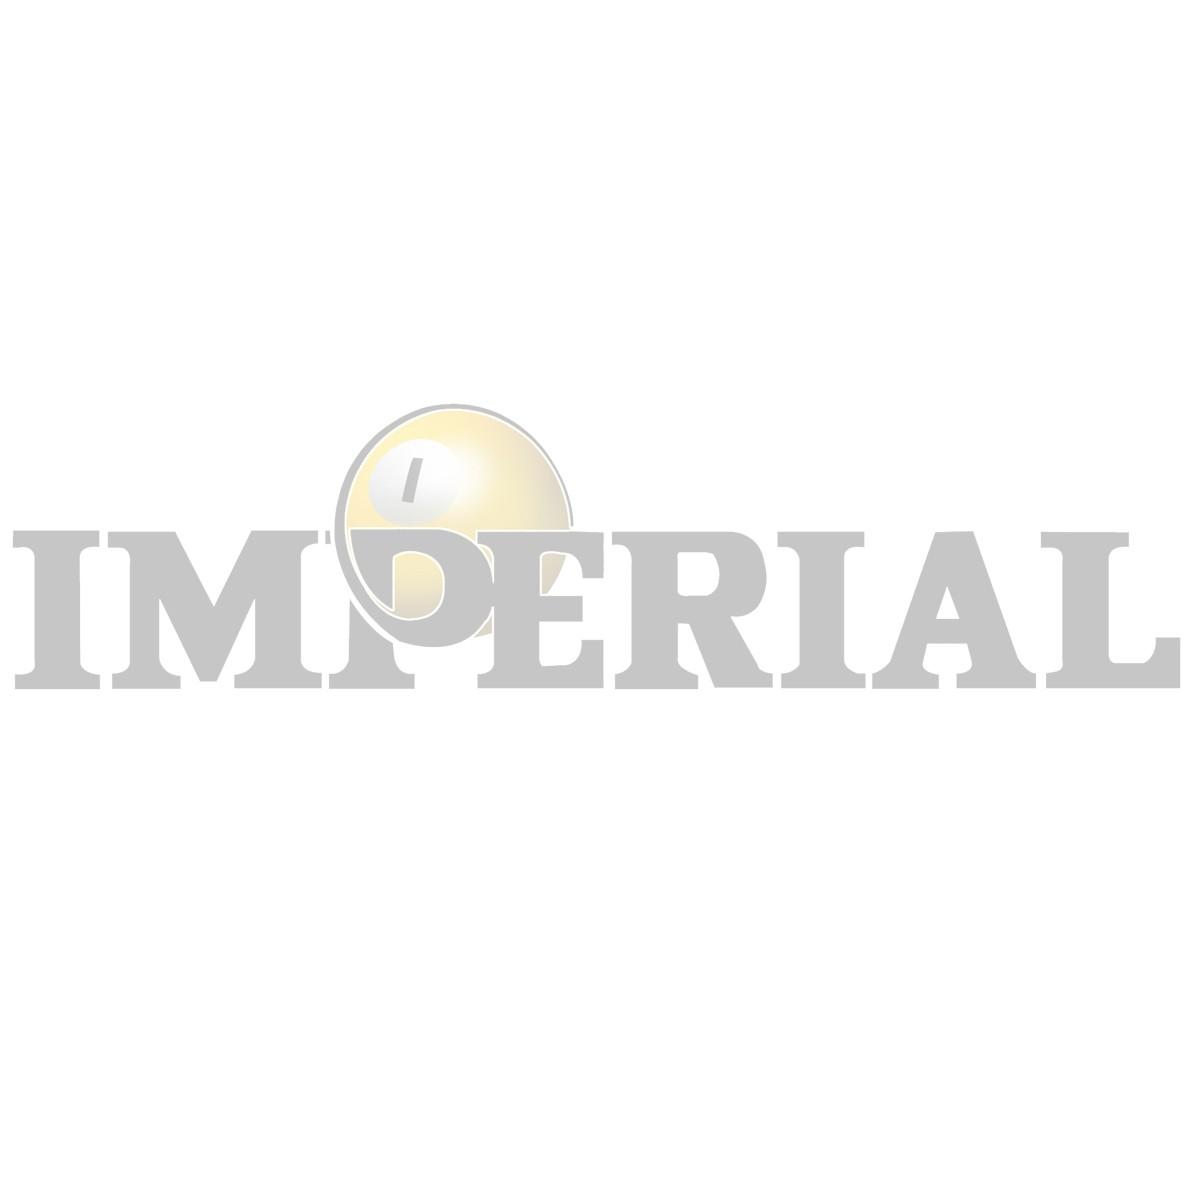 Cincinnati Bengals Home vs. Away Billiard Ball Set